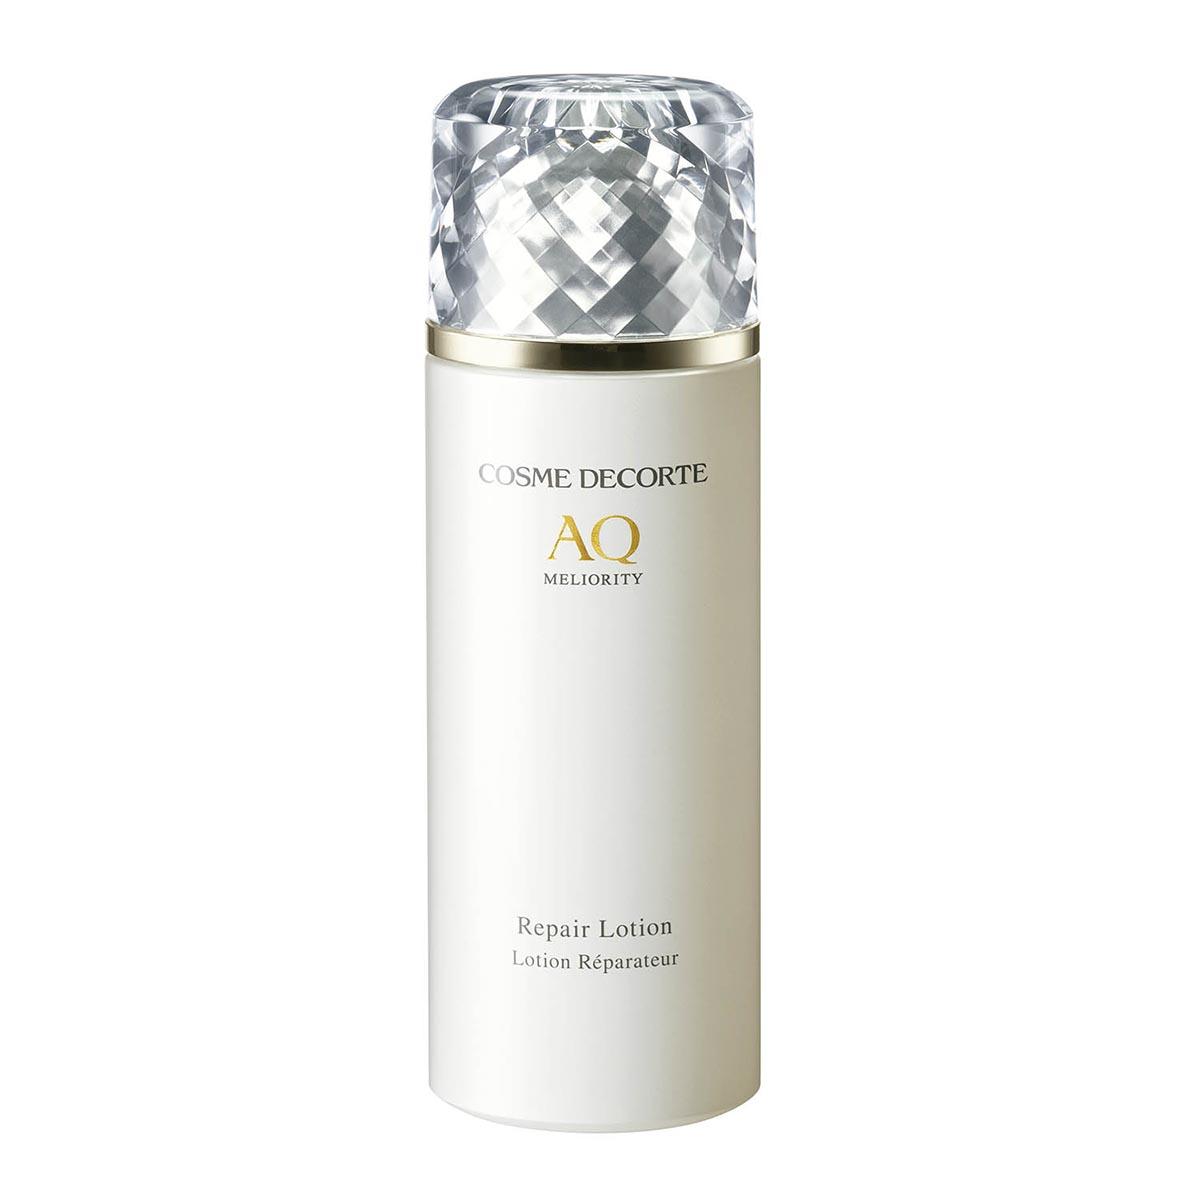 Cosme decorte aq repair lotion 200ml